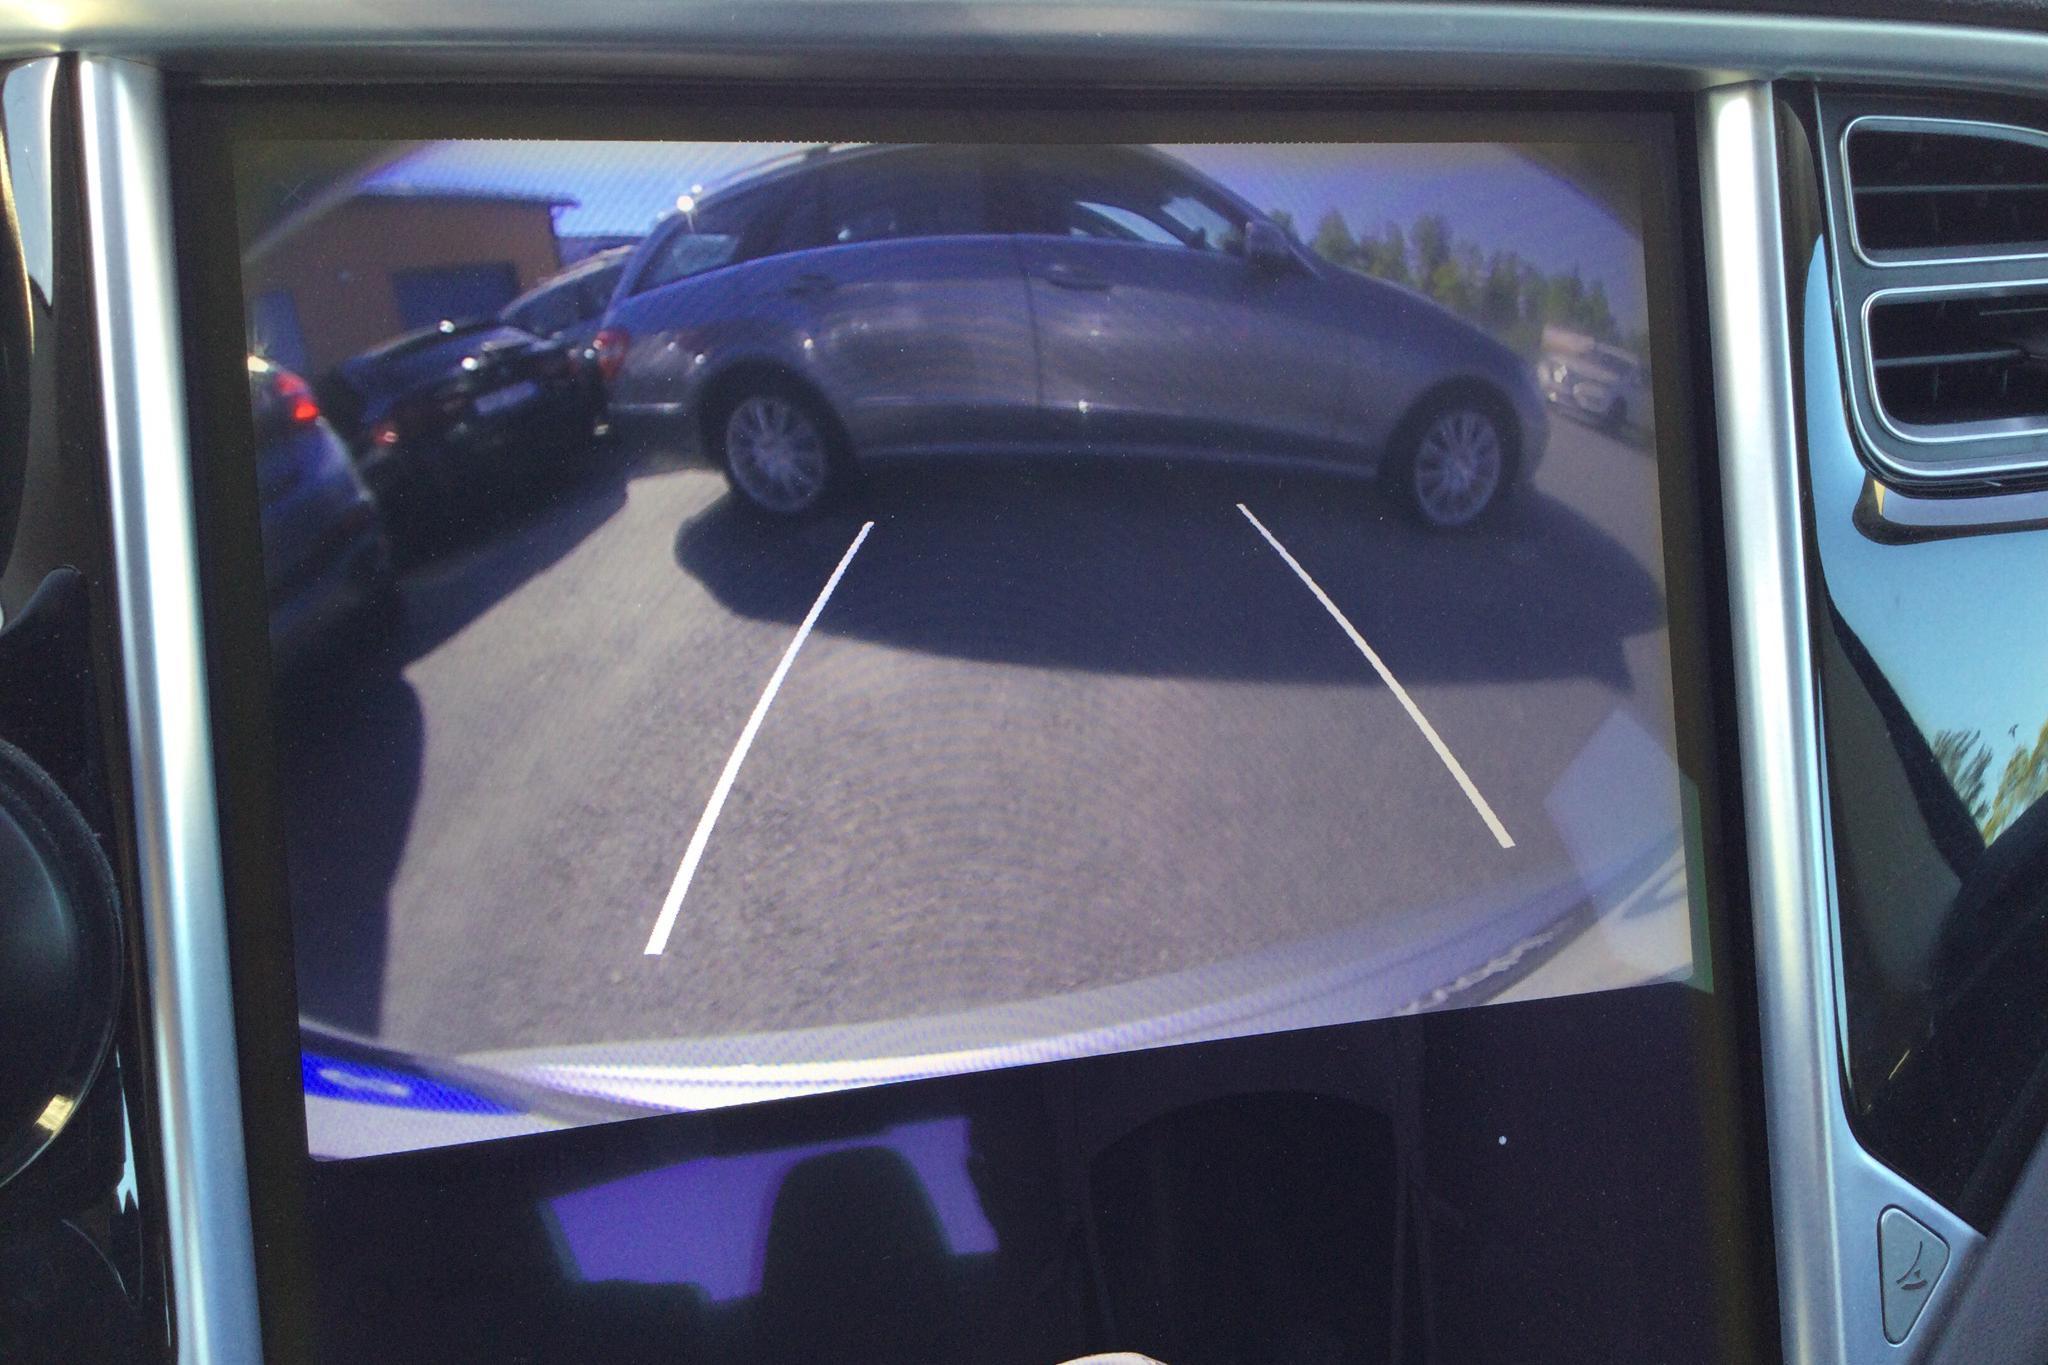 Tesla Model S 85D - 273 250 km - Automatic - gray - 2015